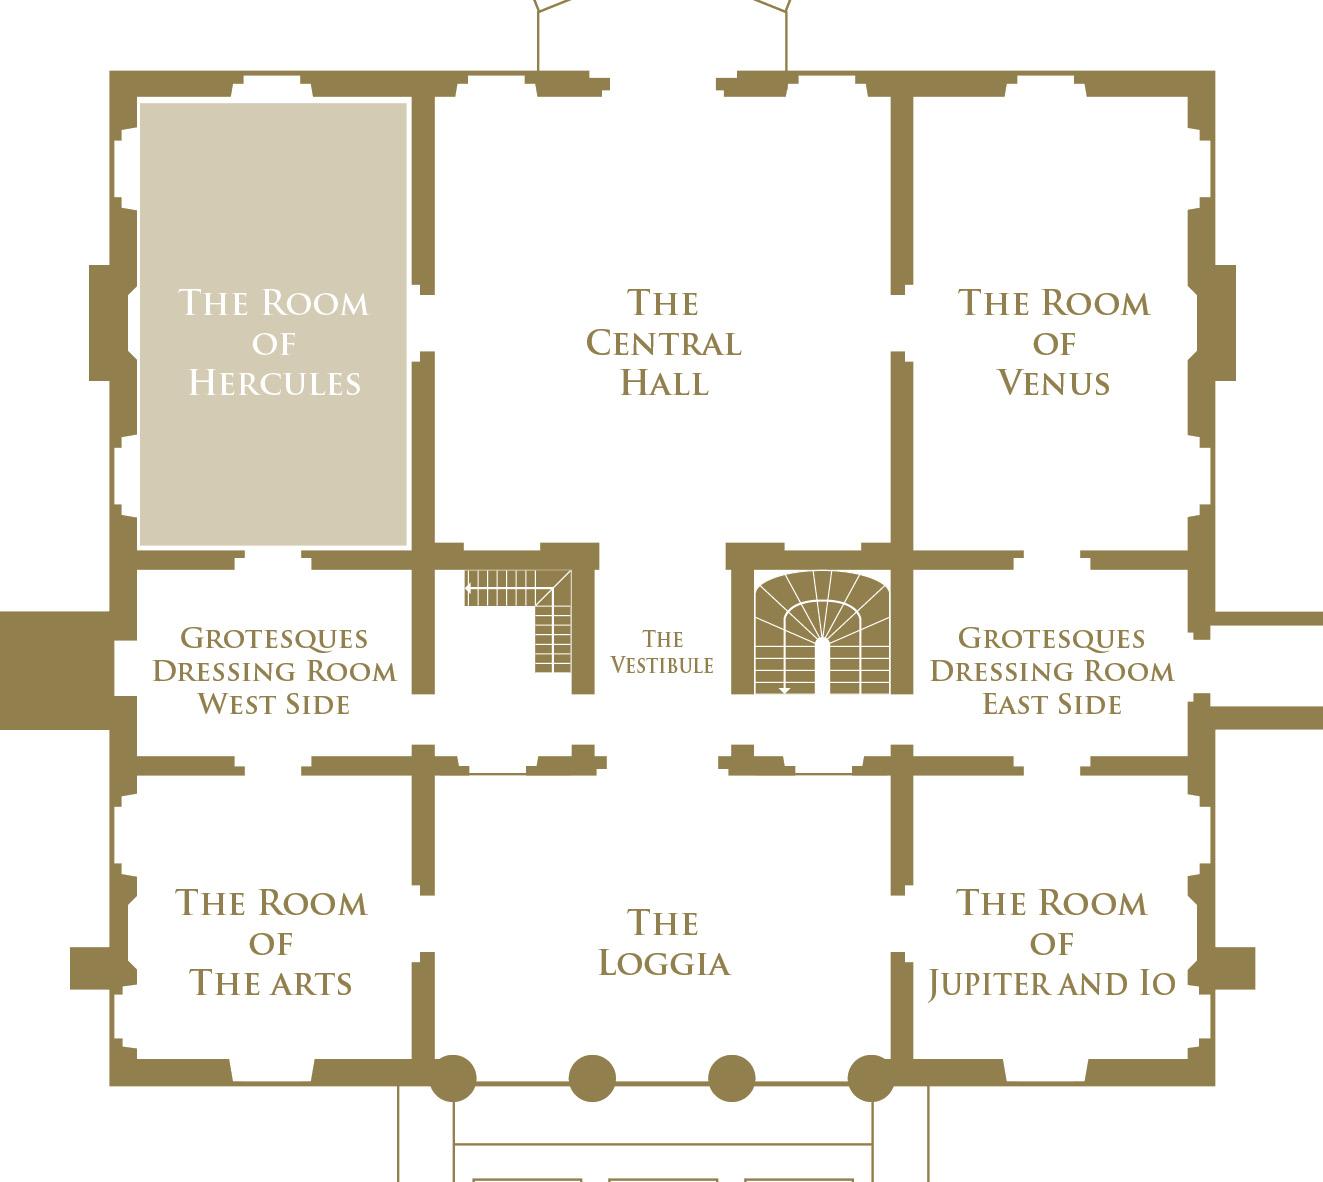 The Room of Hercules